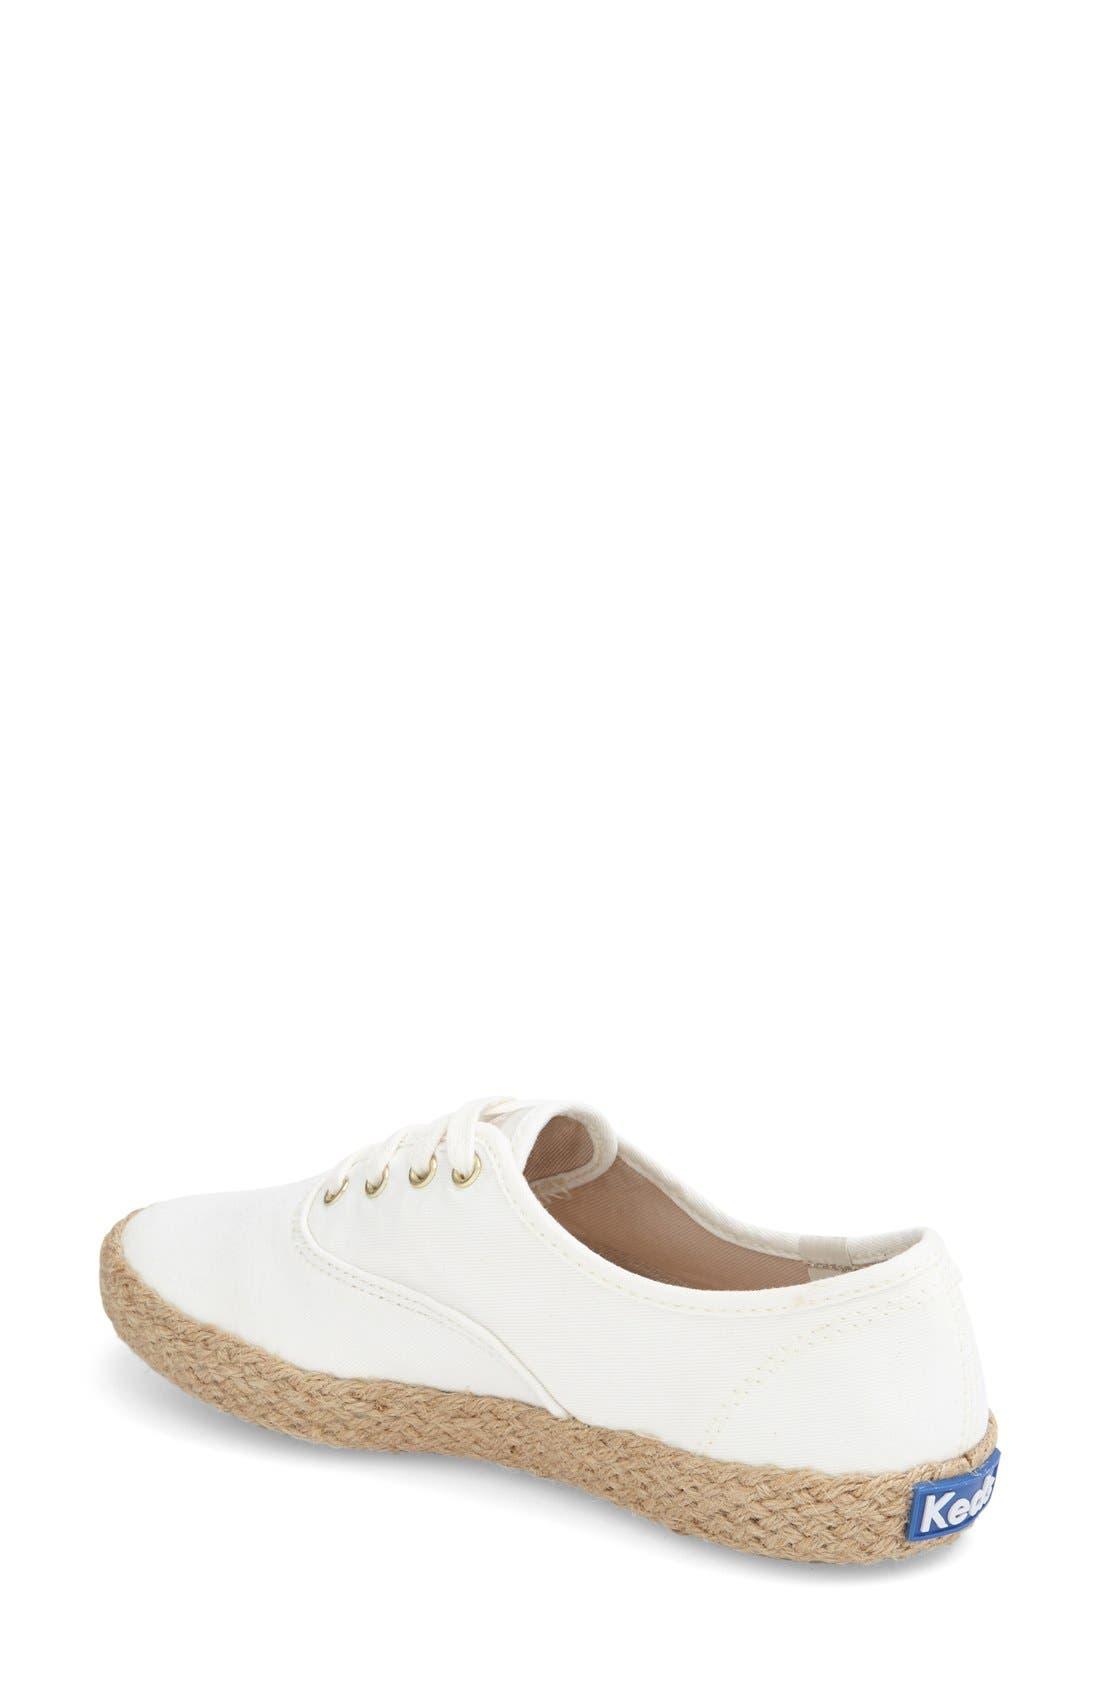 Alternate Image 2  - Keds® 'Champion - Jute' Sneaker (Women)